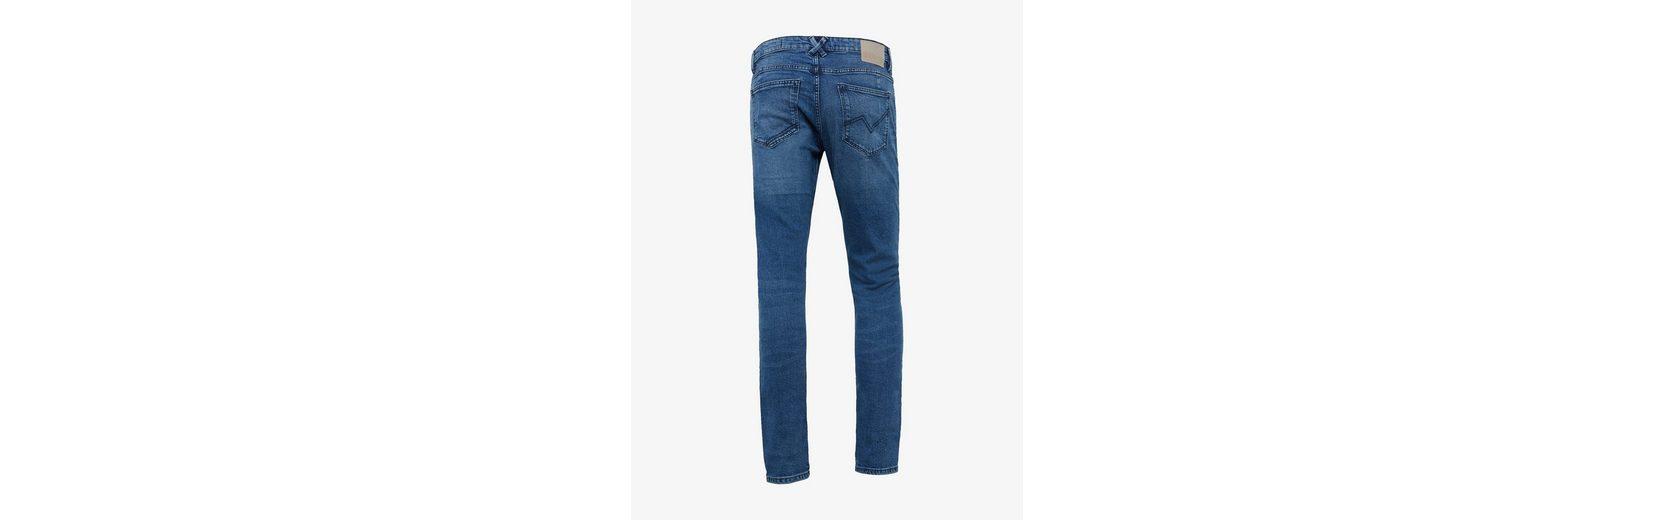 Tom Tailor Denim 5-Pocket-Jeans Piers Super Slim Jeans Shop-Angebot pfTuxXj